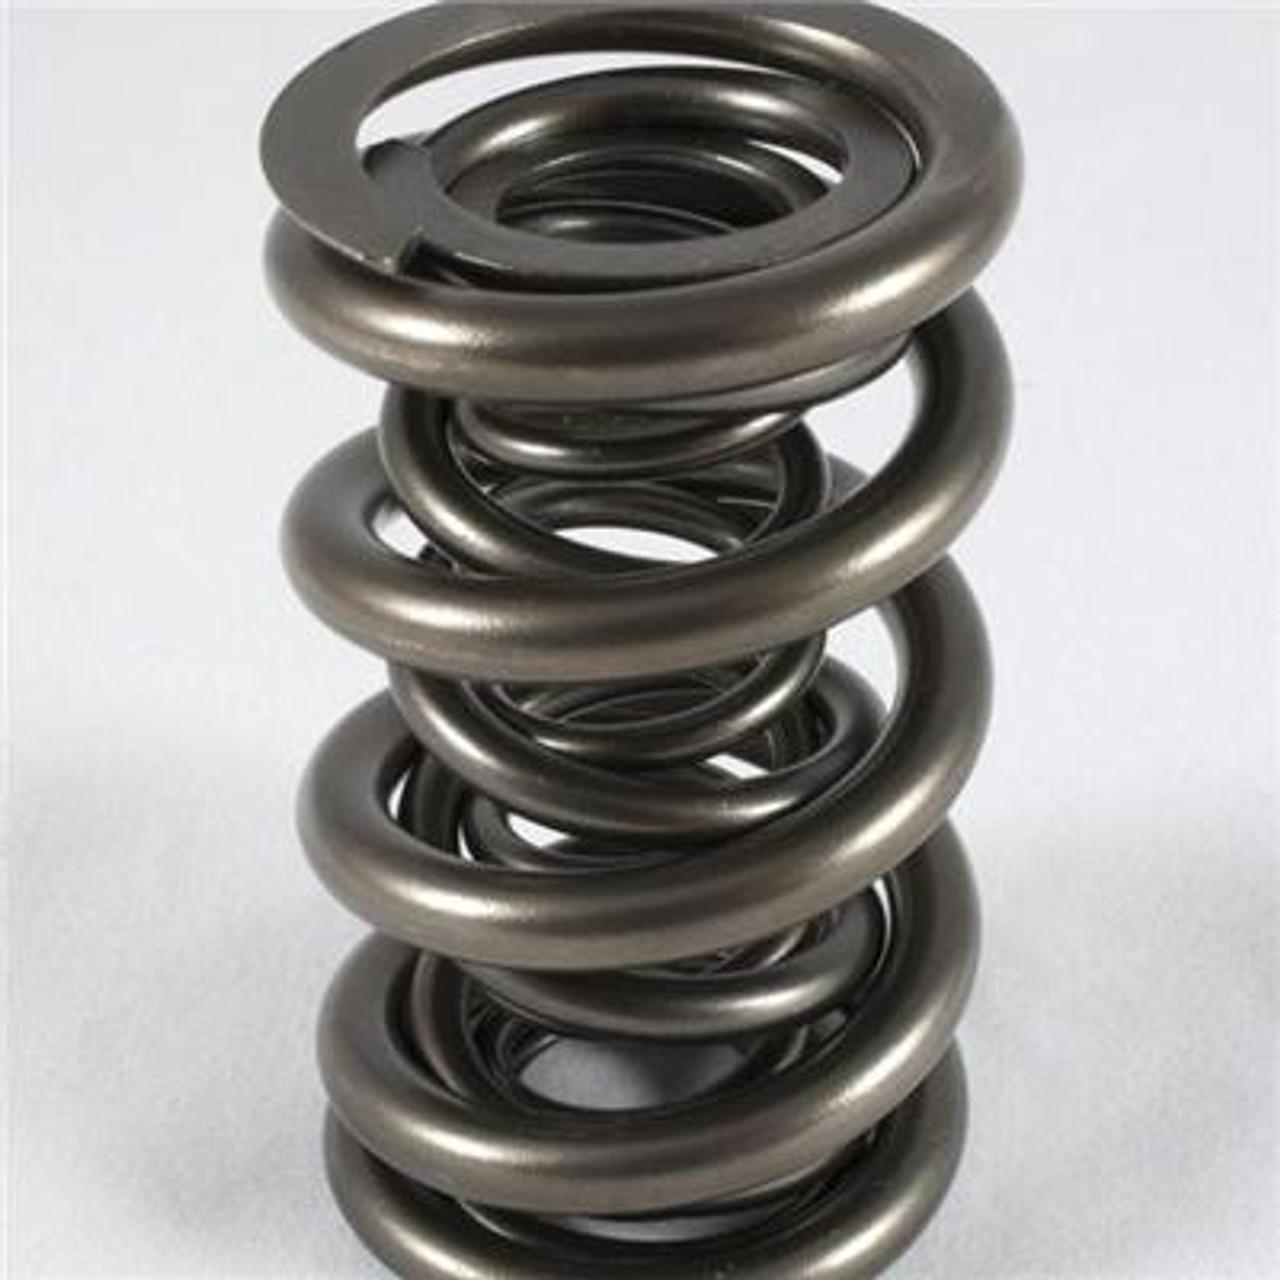 PAC-1258 •Seat Pressure: 350 LBS @ 2.150 Open Pressure: 1004 LBS @ 1.200 Coil Bind: 1.130 Max Lift: .950 16/pkg